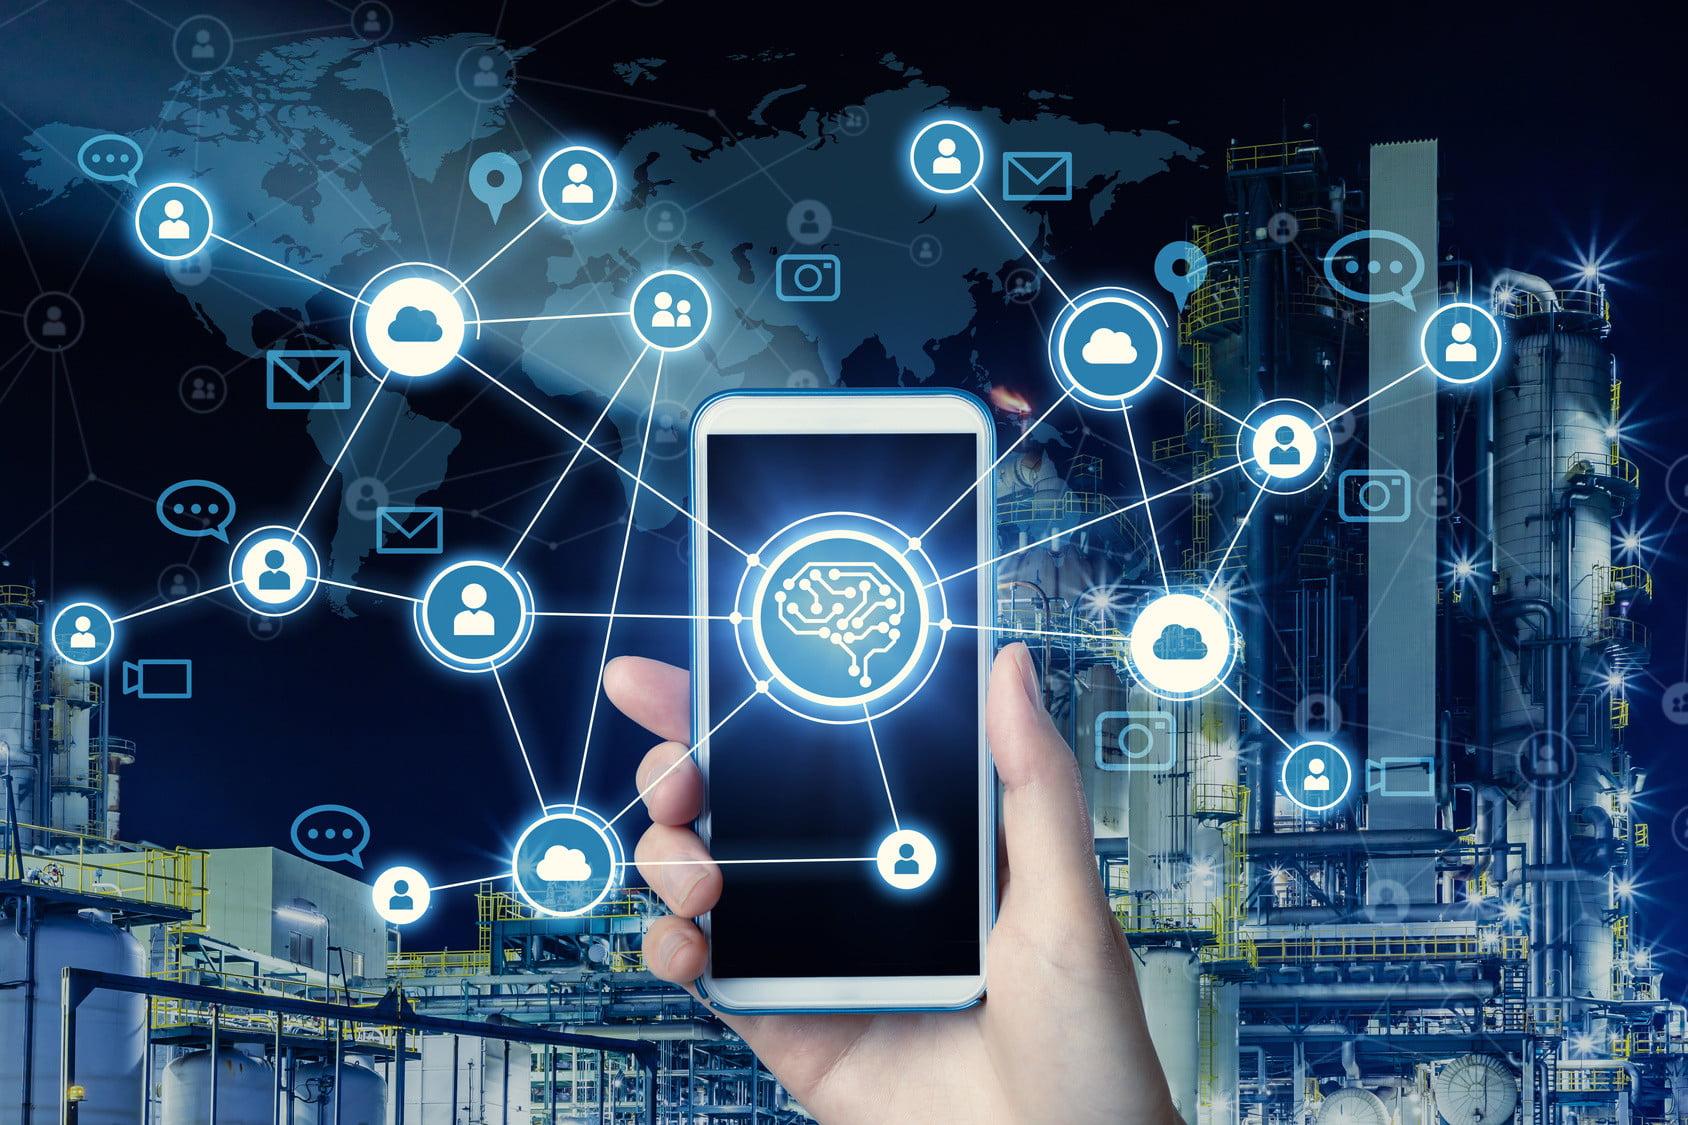 fotolia 171716409 m chombosan 2 - The Rise Of Digitalization - Blockchain Use Case: Food Intake